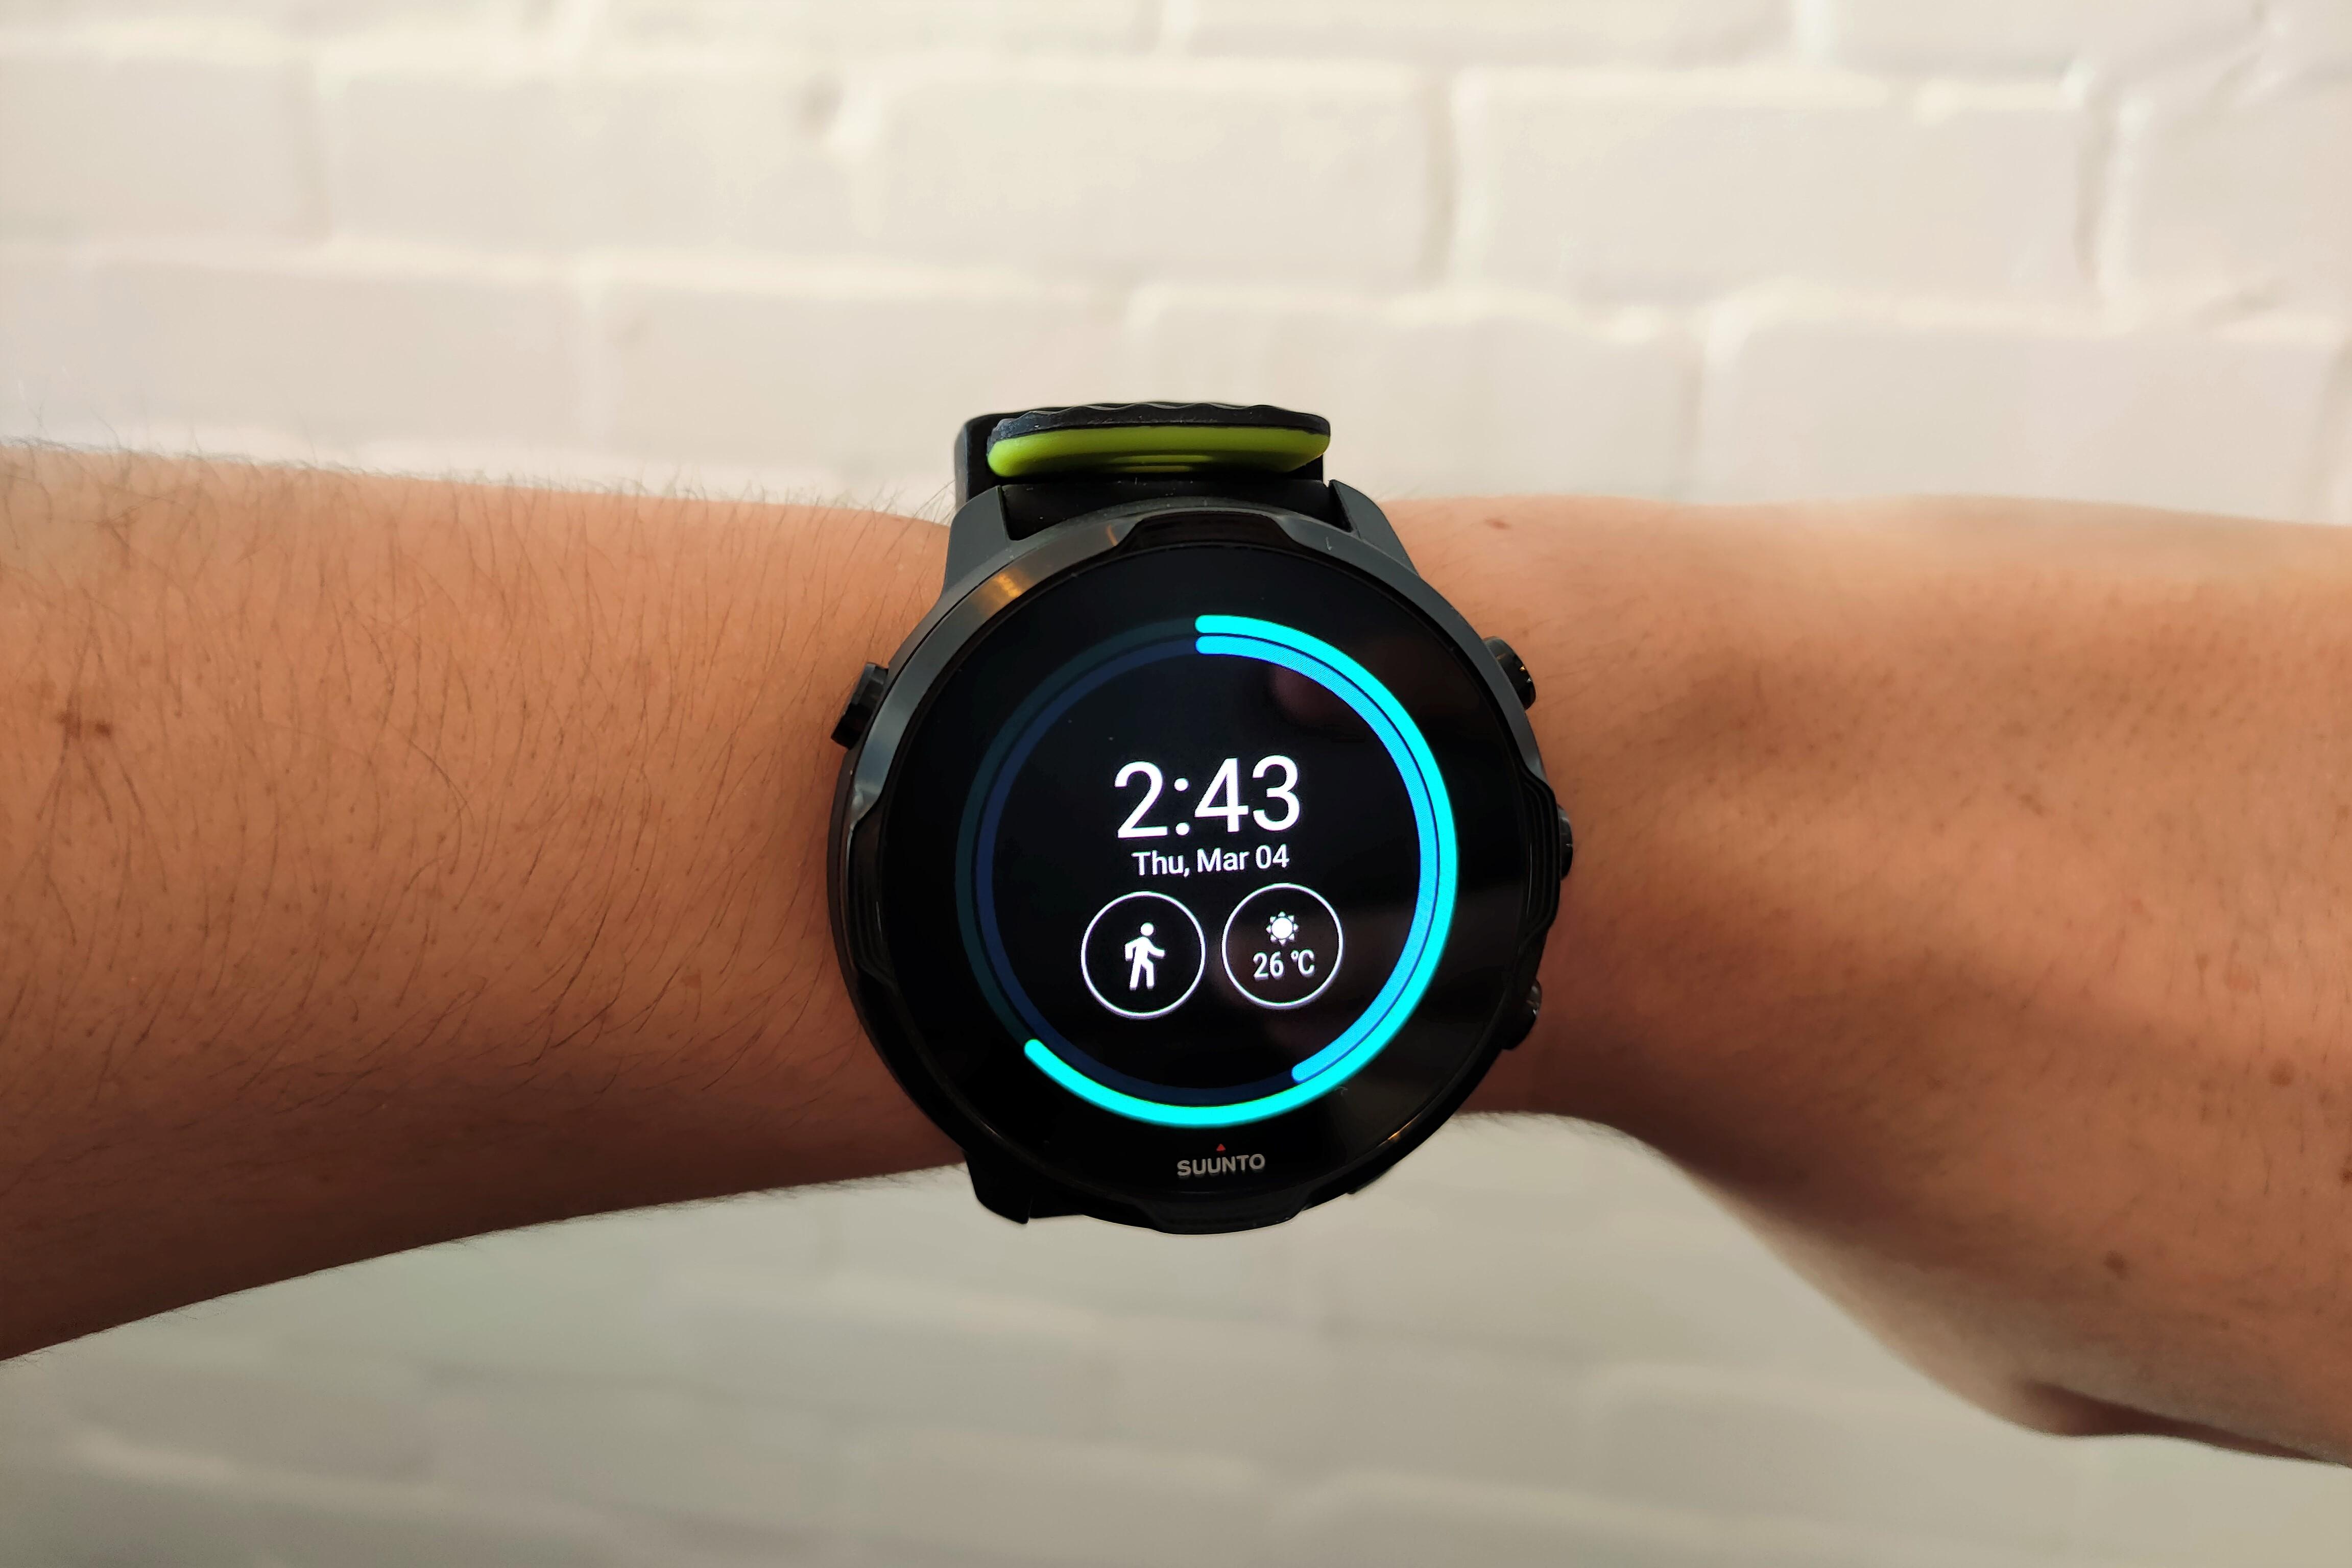 Black Lime Suunto 7 smart watch on a woman's wrist